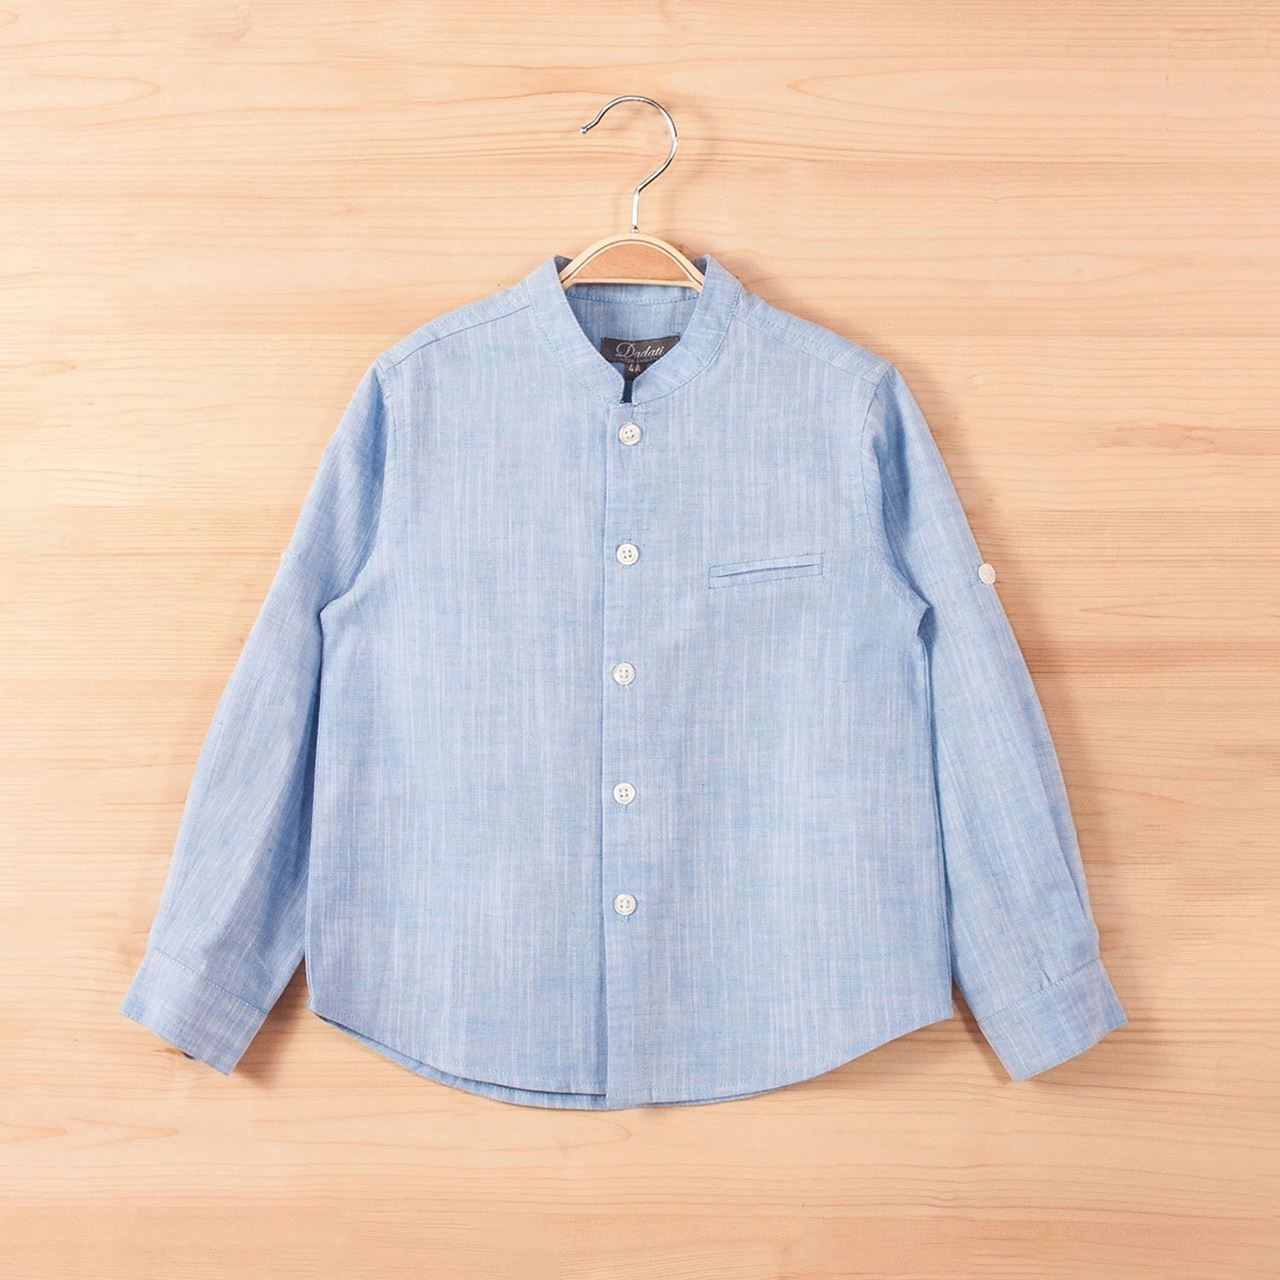 Imagen de Camisa jr brisa azul